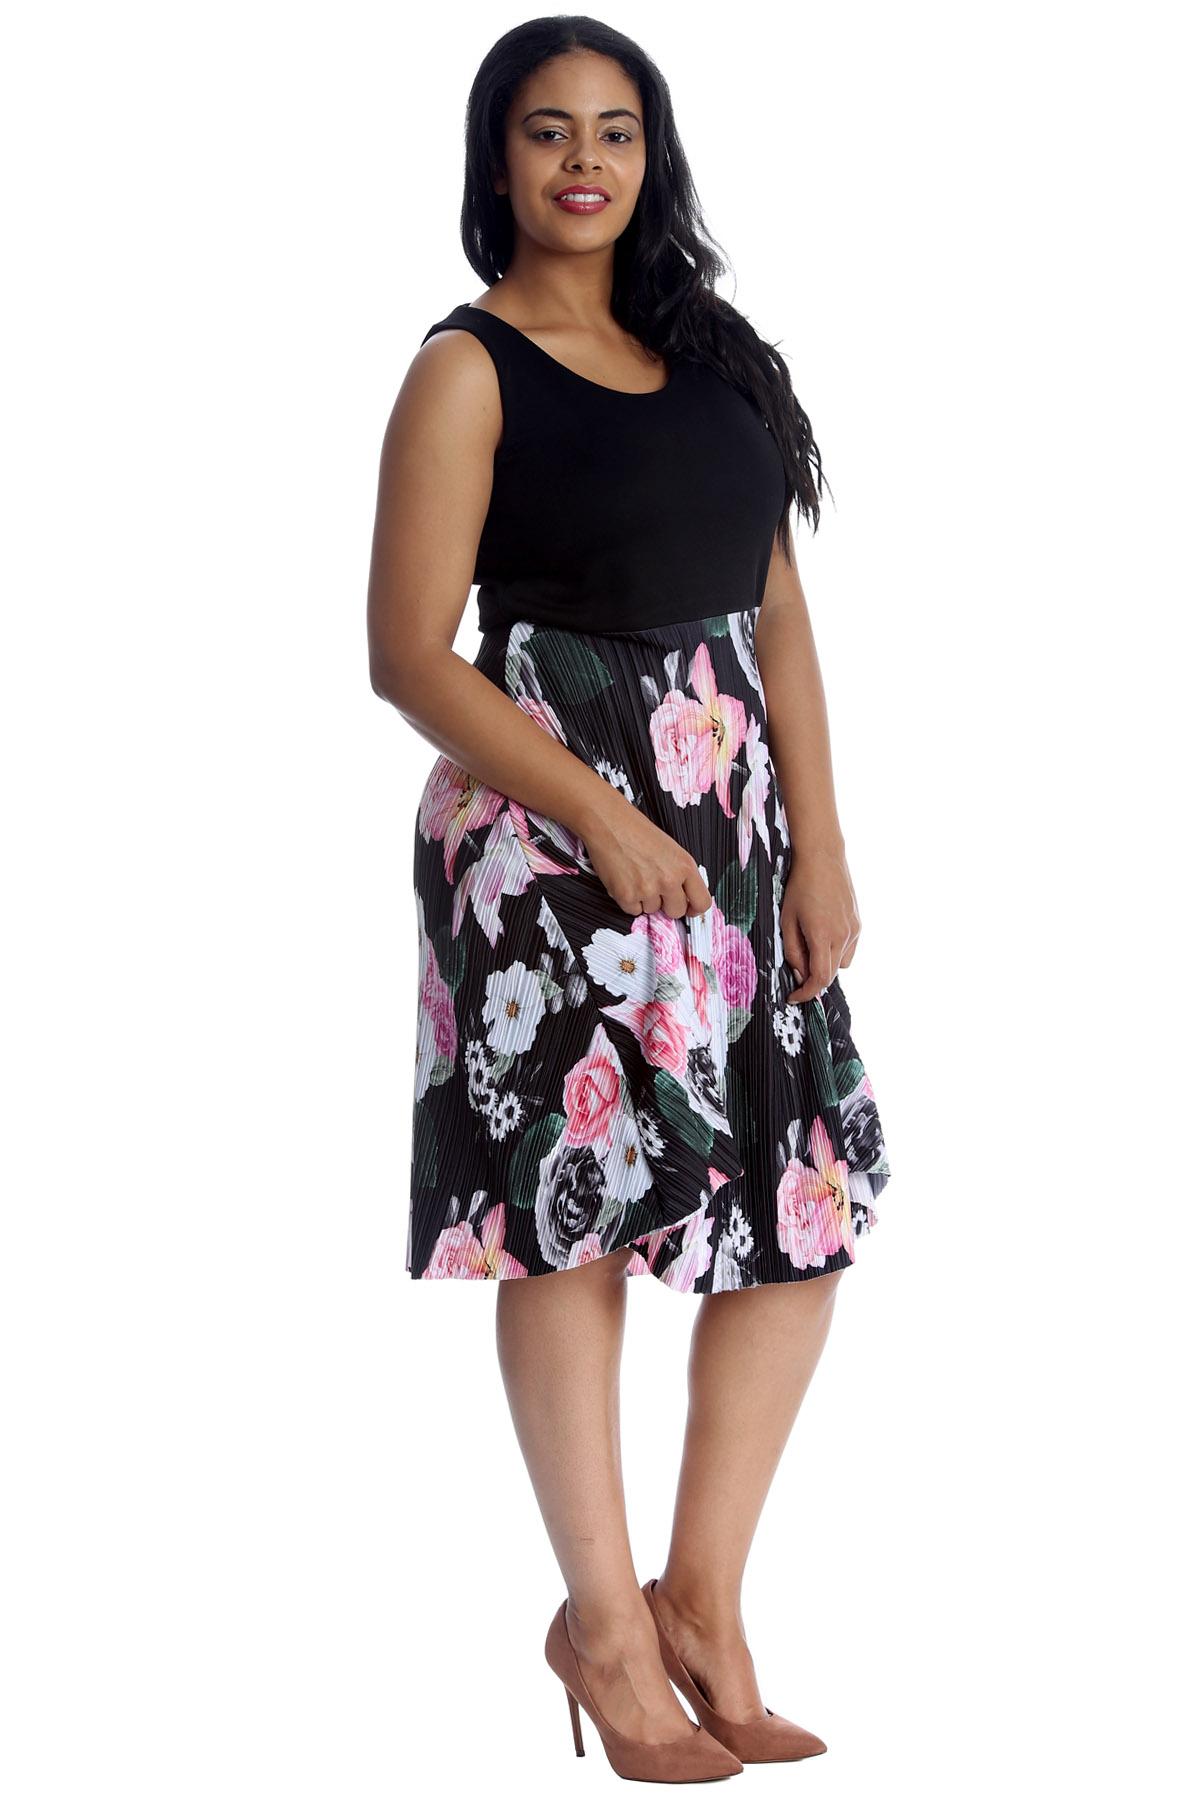 New Womens Dress Plus Size Ladies Floral Print Skater Style Sleeveless Skirt Top | eBay